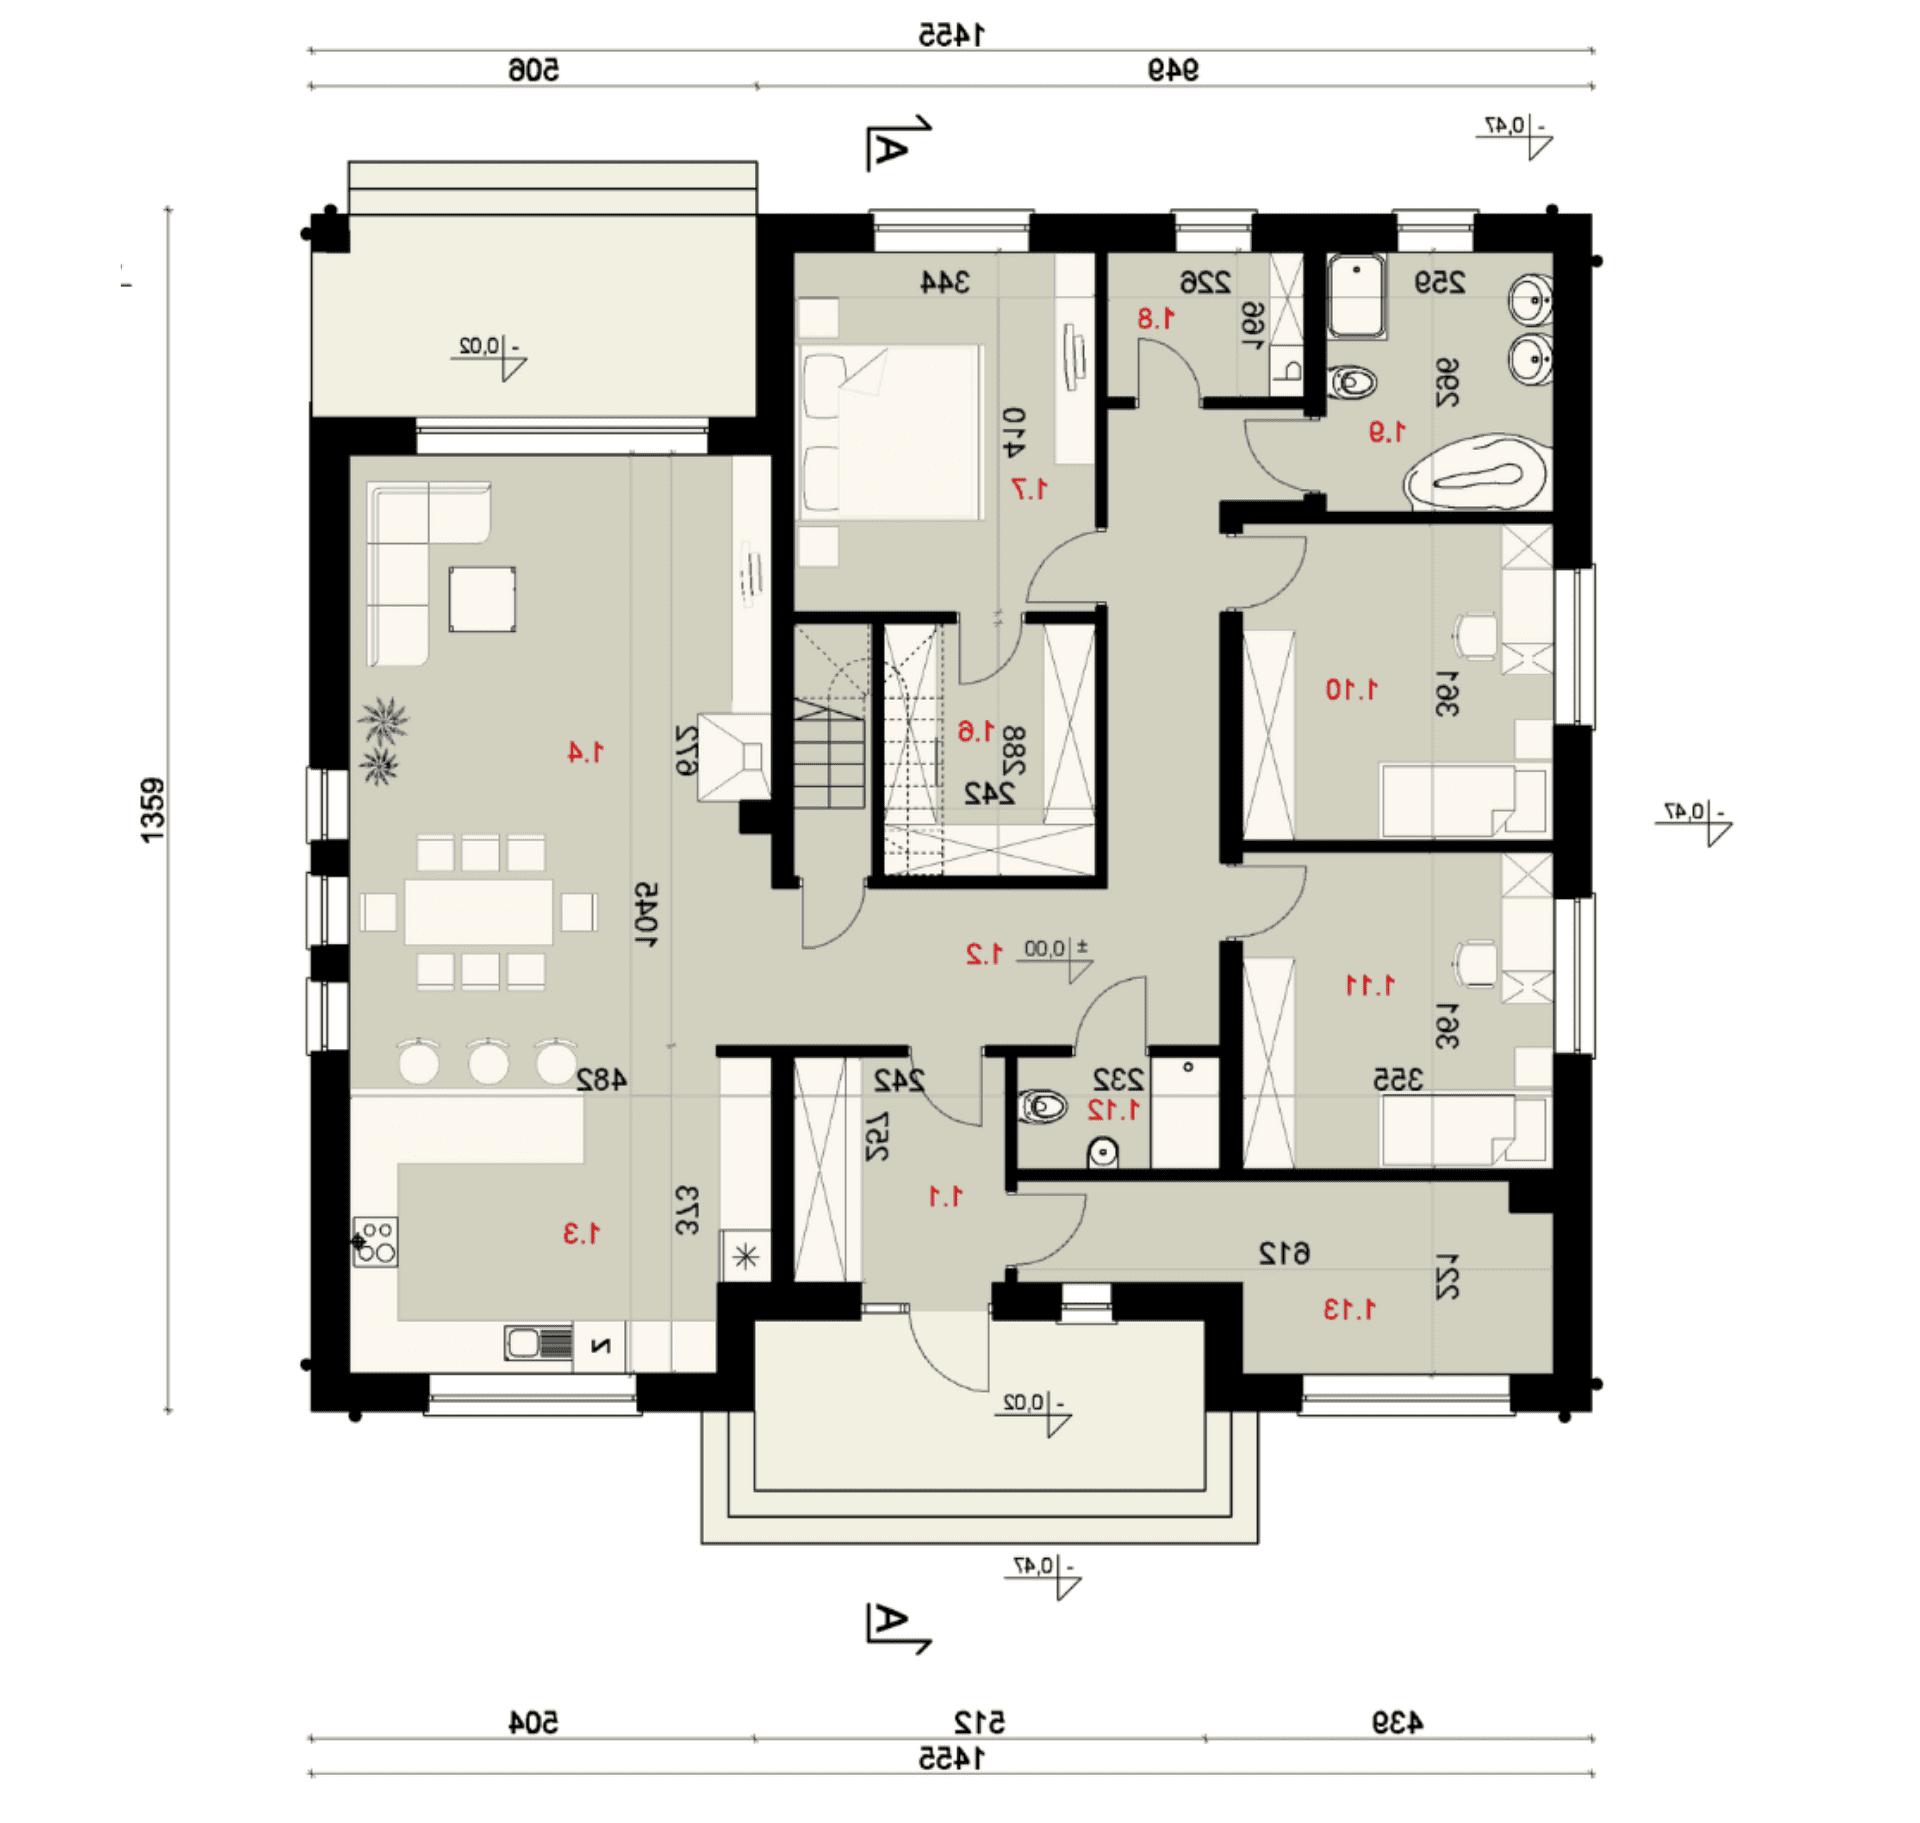 Rzut parteru - projekt domu SEJ-PRO 006 ENERGO - odbicie lustrzane